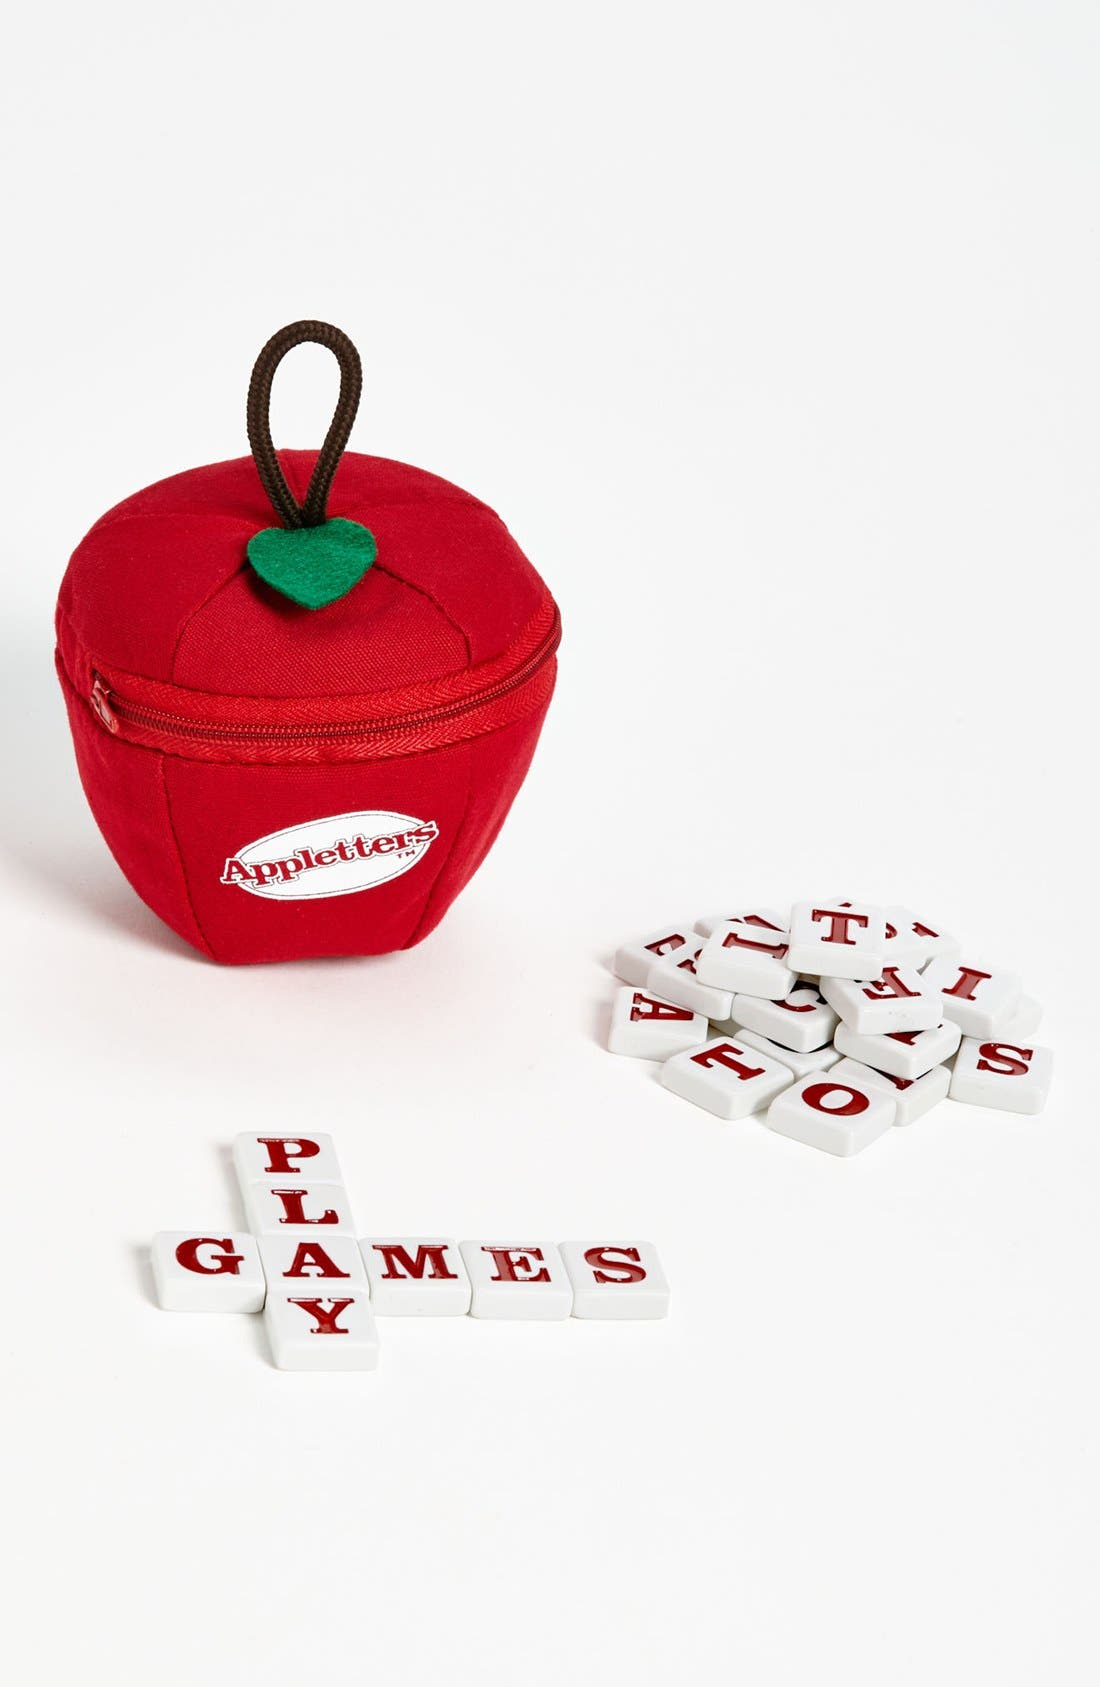 Main Image - Bananagrams 'Appletters' Game